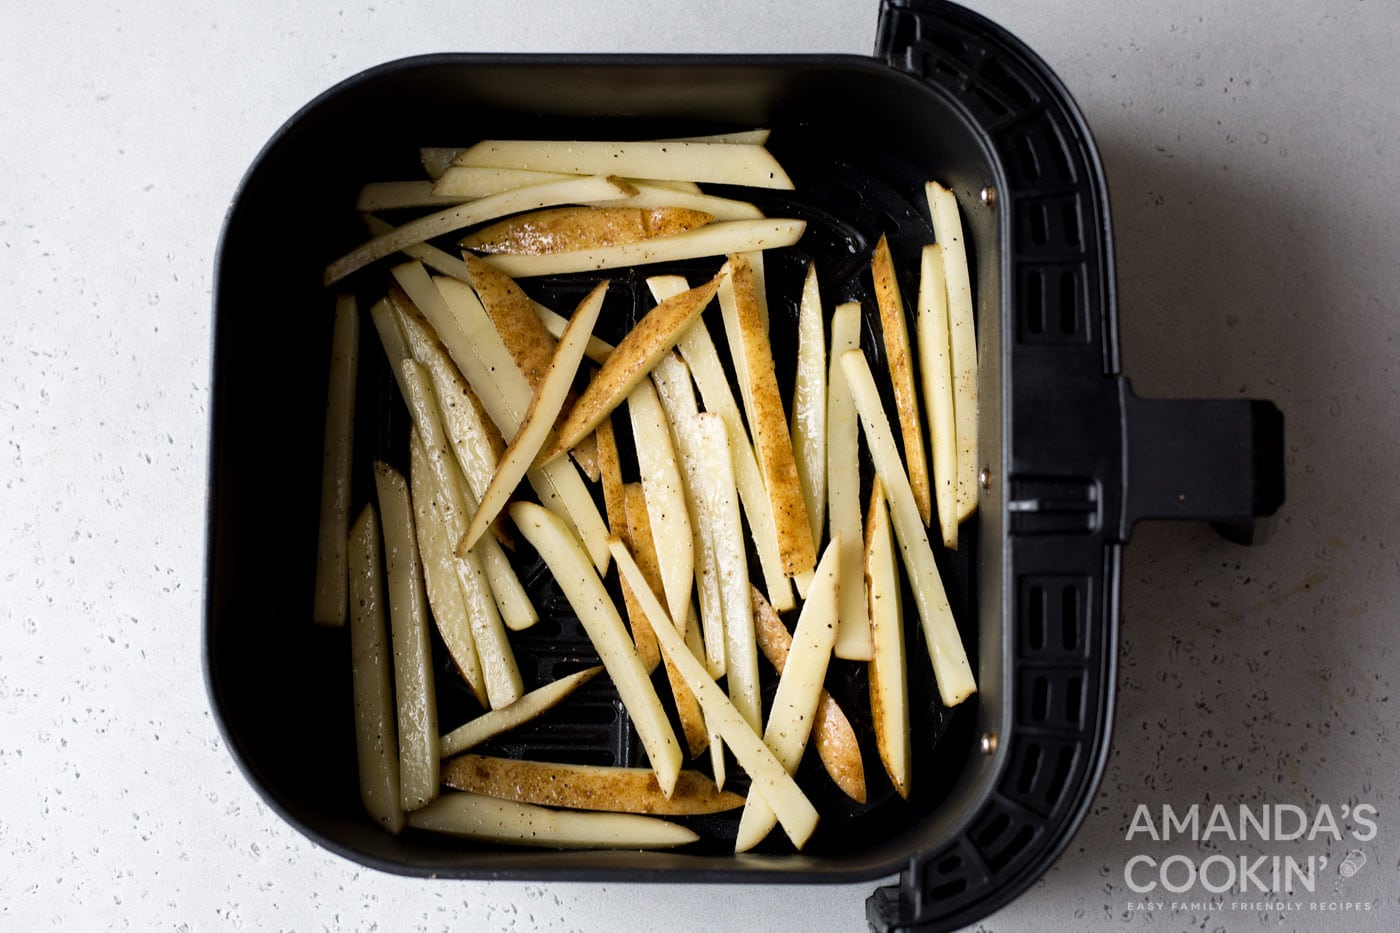 potato slices in air fryer basket